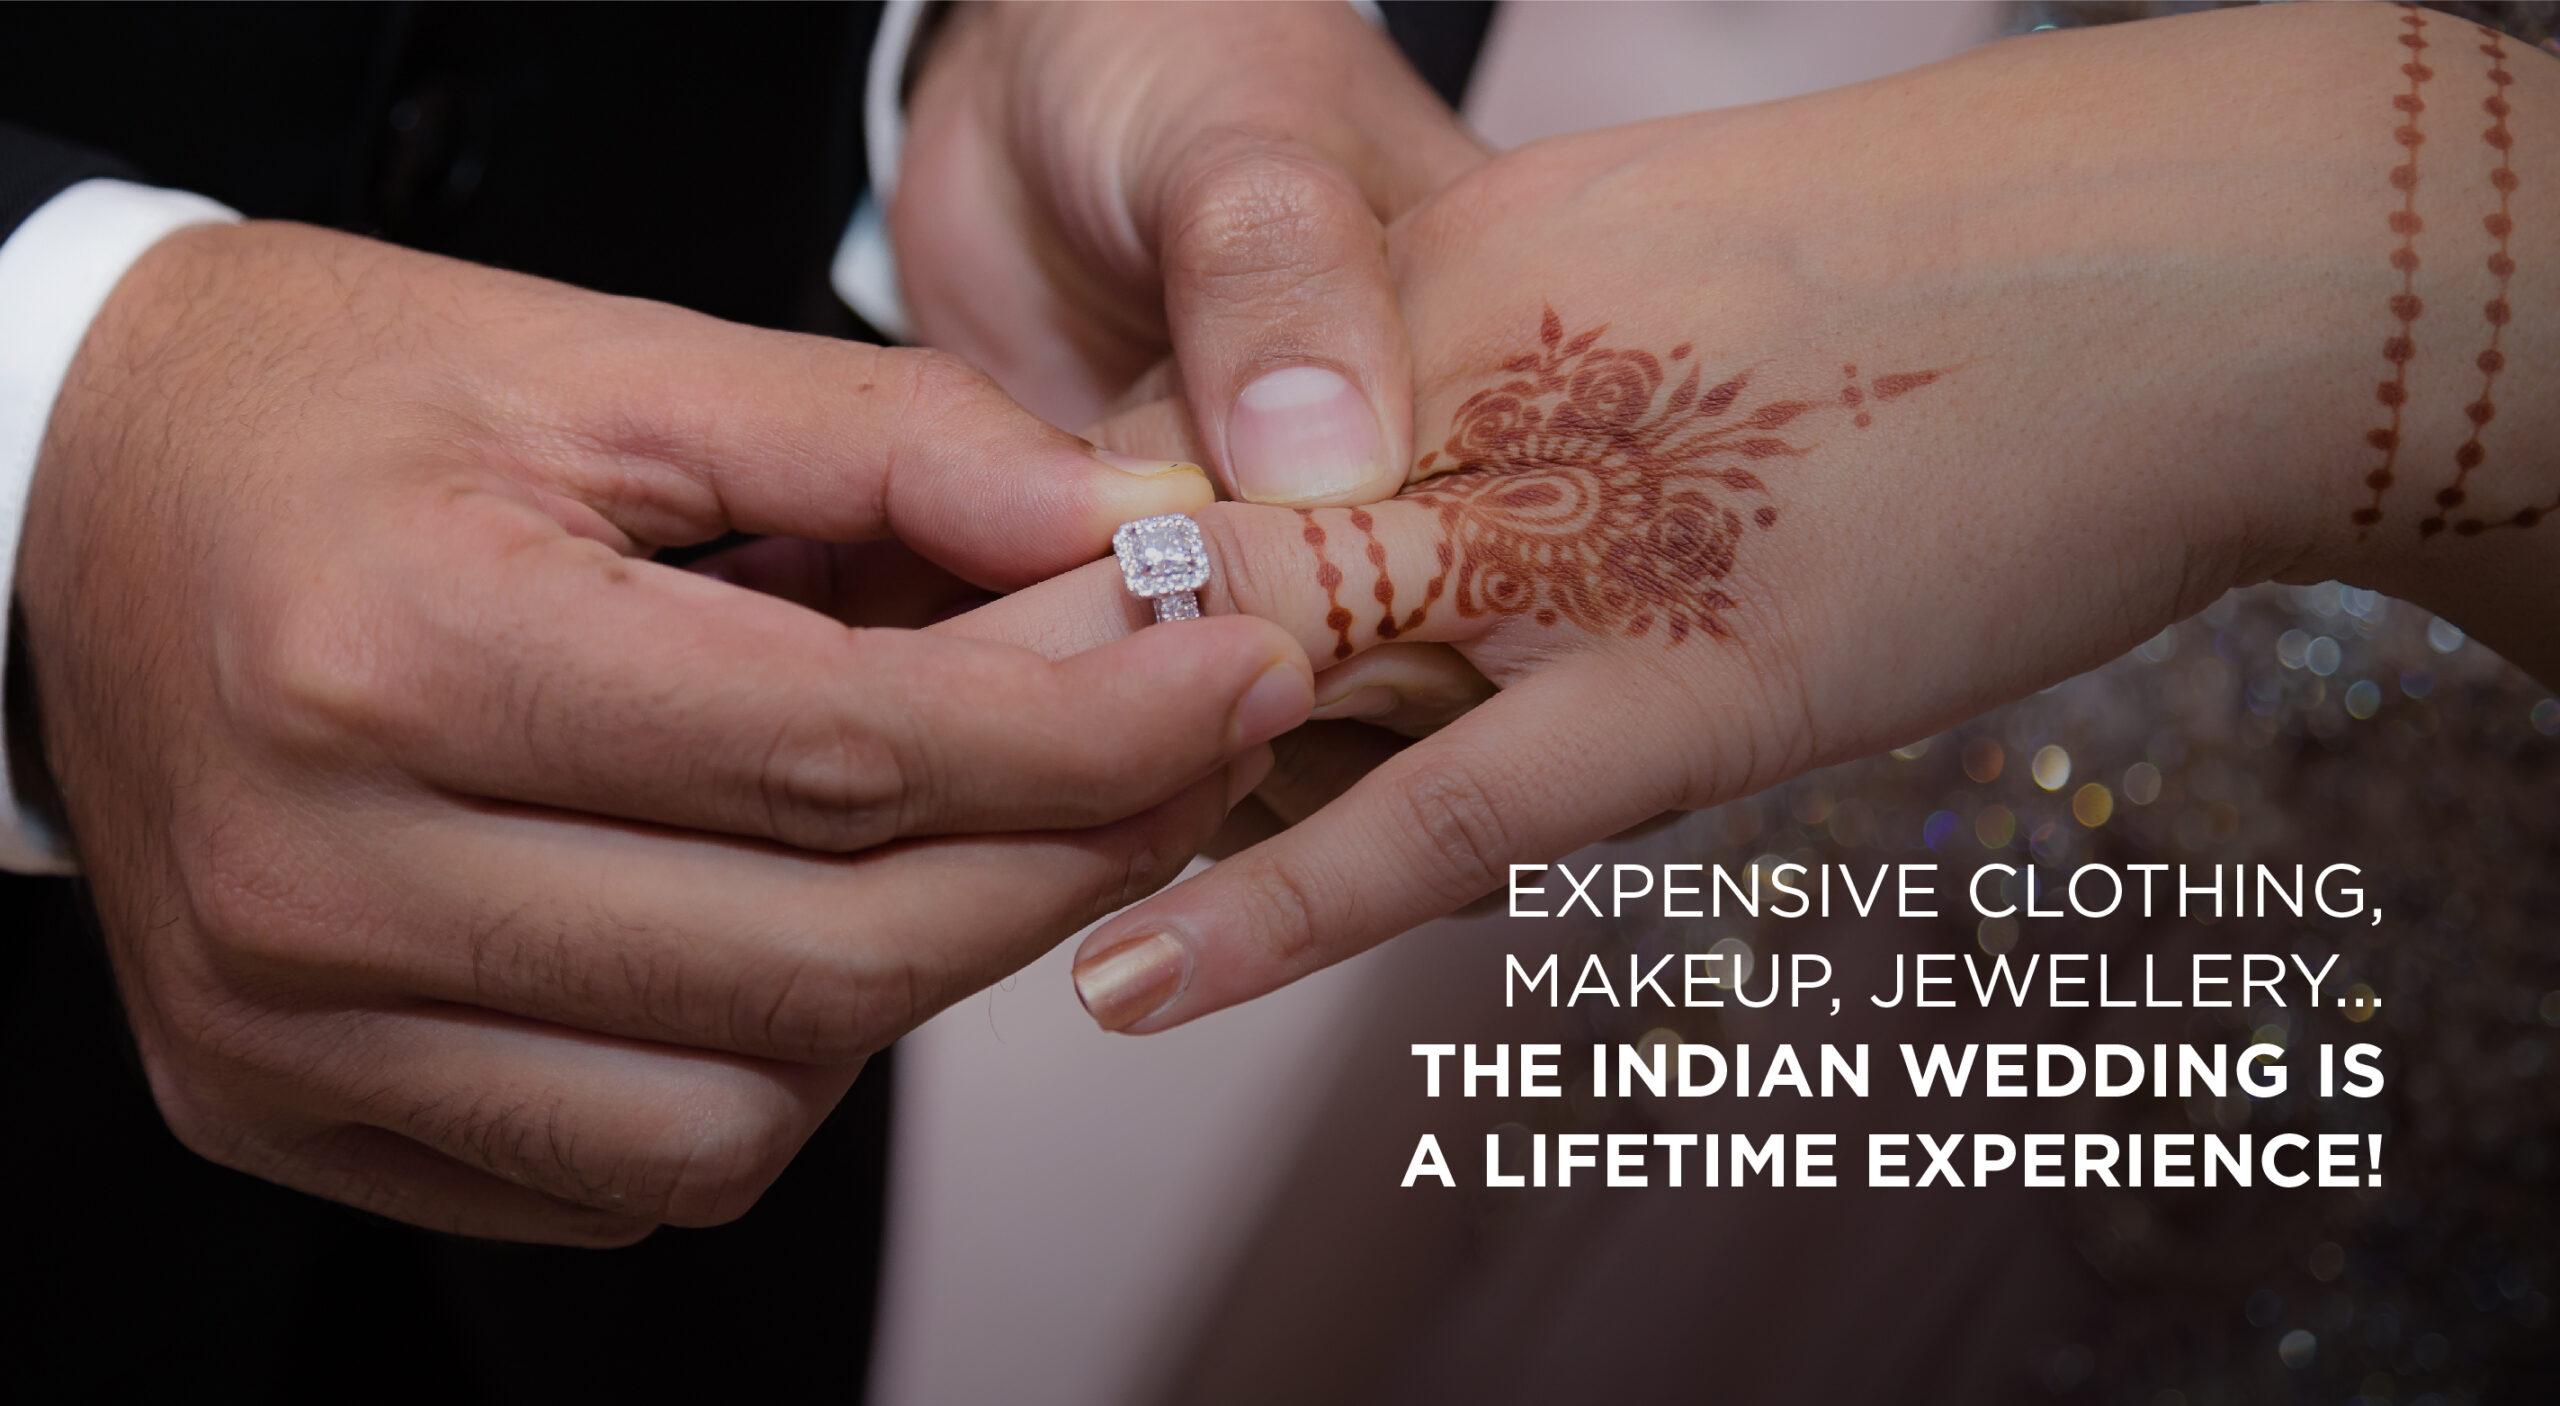 Jewellery for Indian Wedding